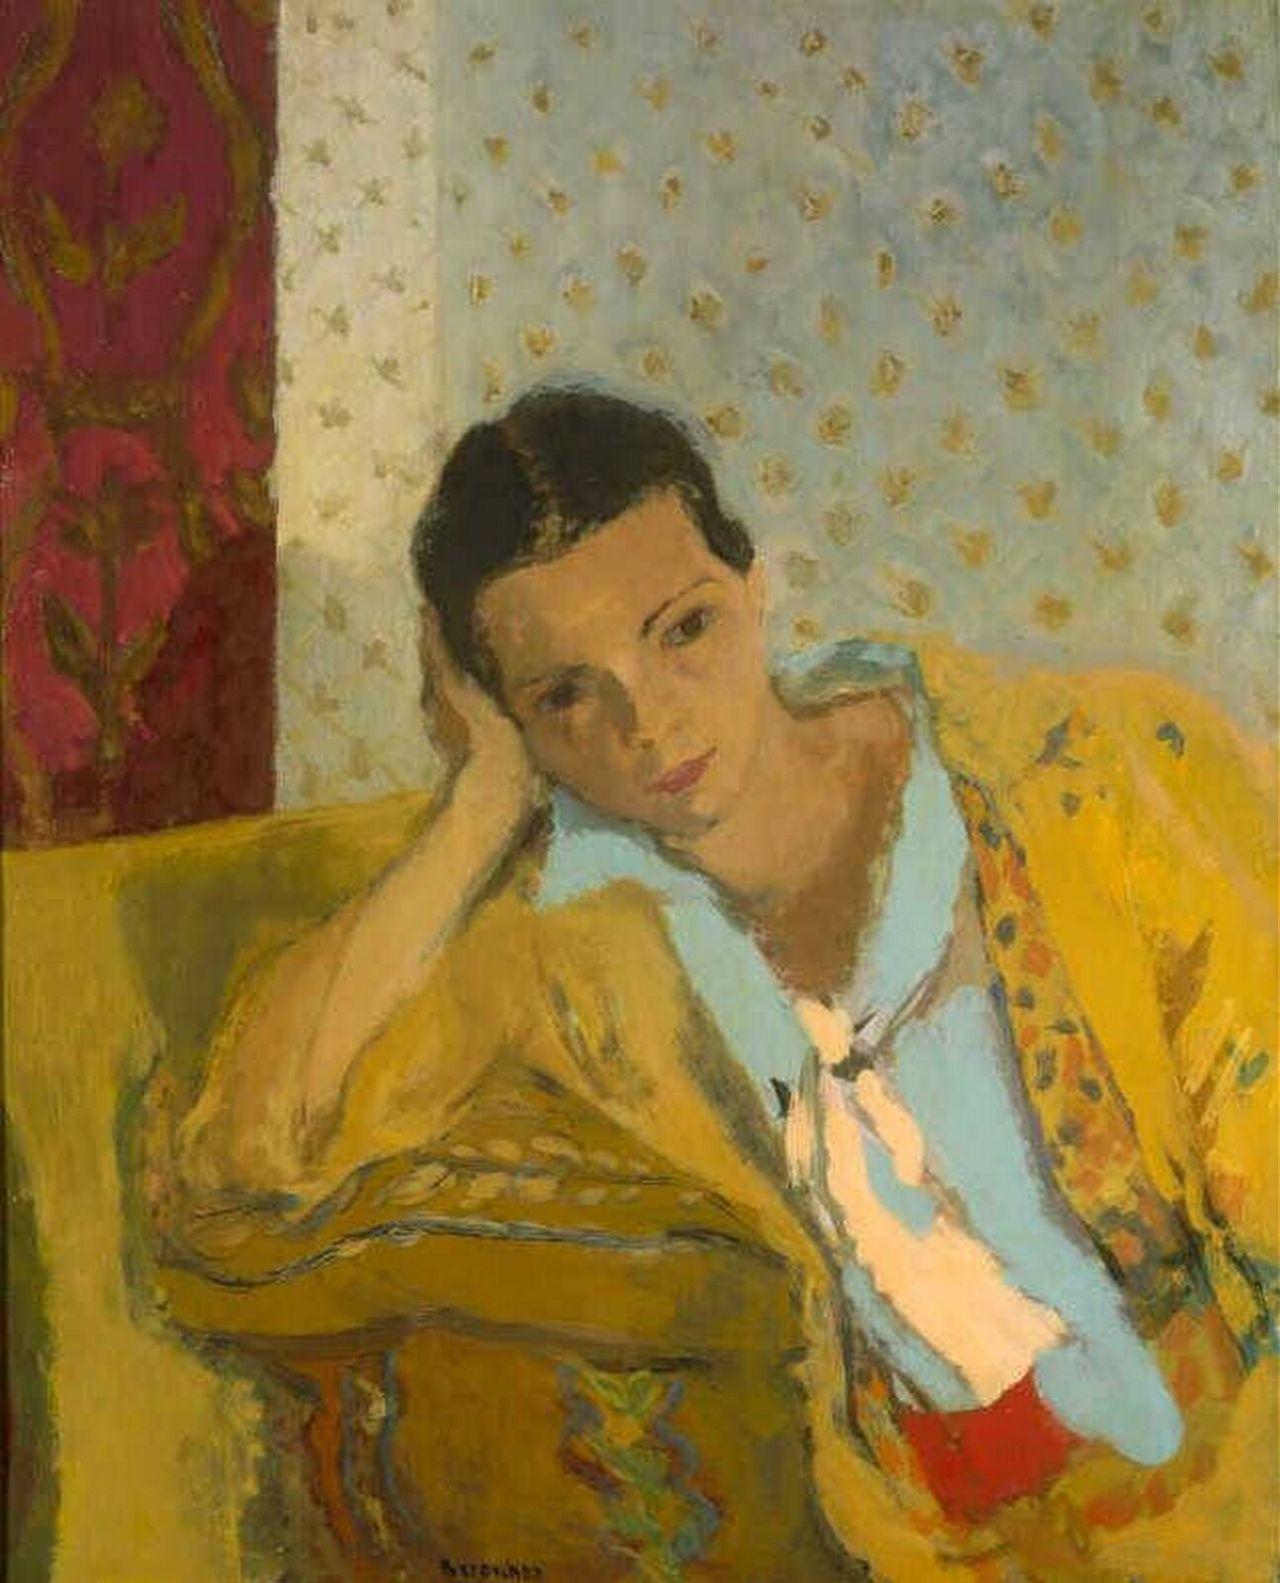 huariqueje:  Marguerite Louppe (Artist's Wife) -  Maurice Brianchon 1934 French 1899-1979 oil on canvas  Museum Boijmans van Beuningen, Rotterdam